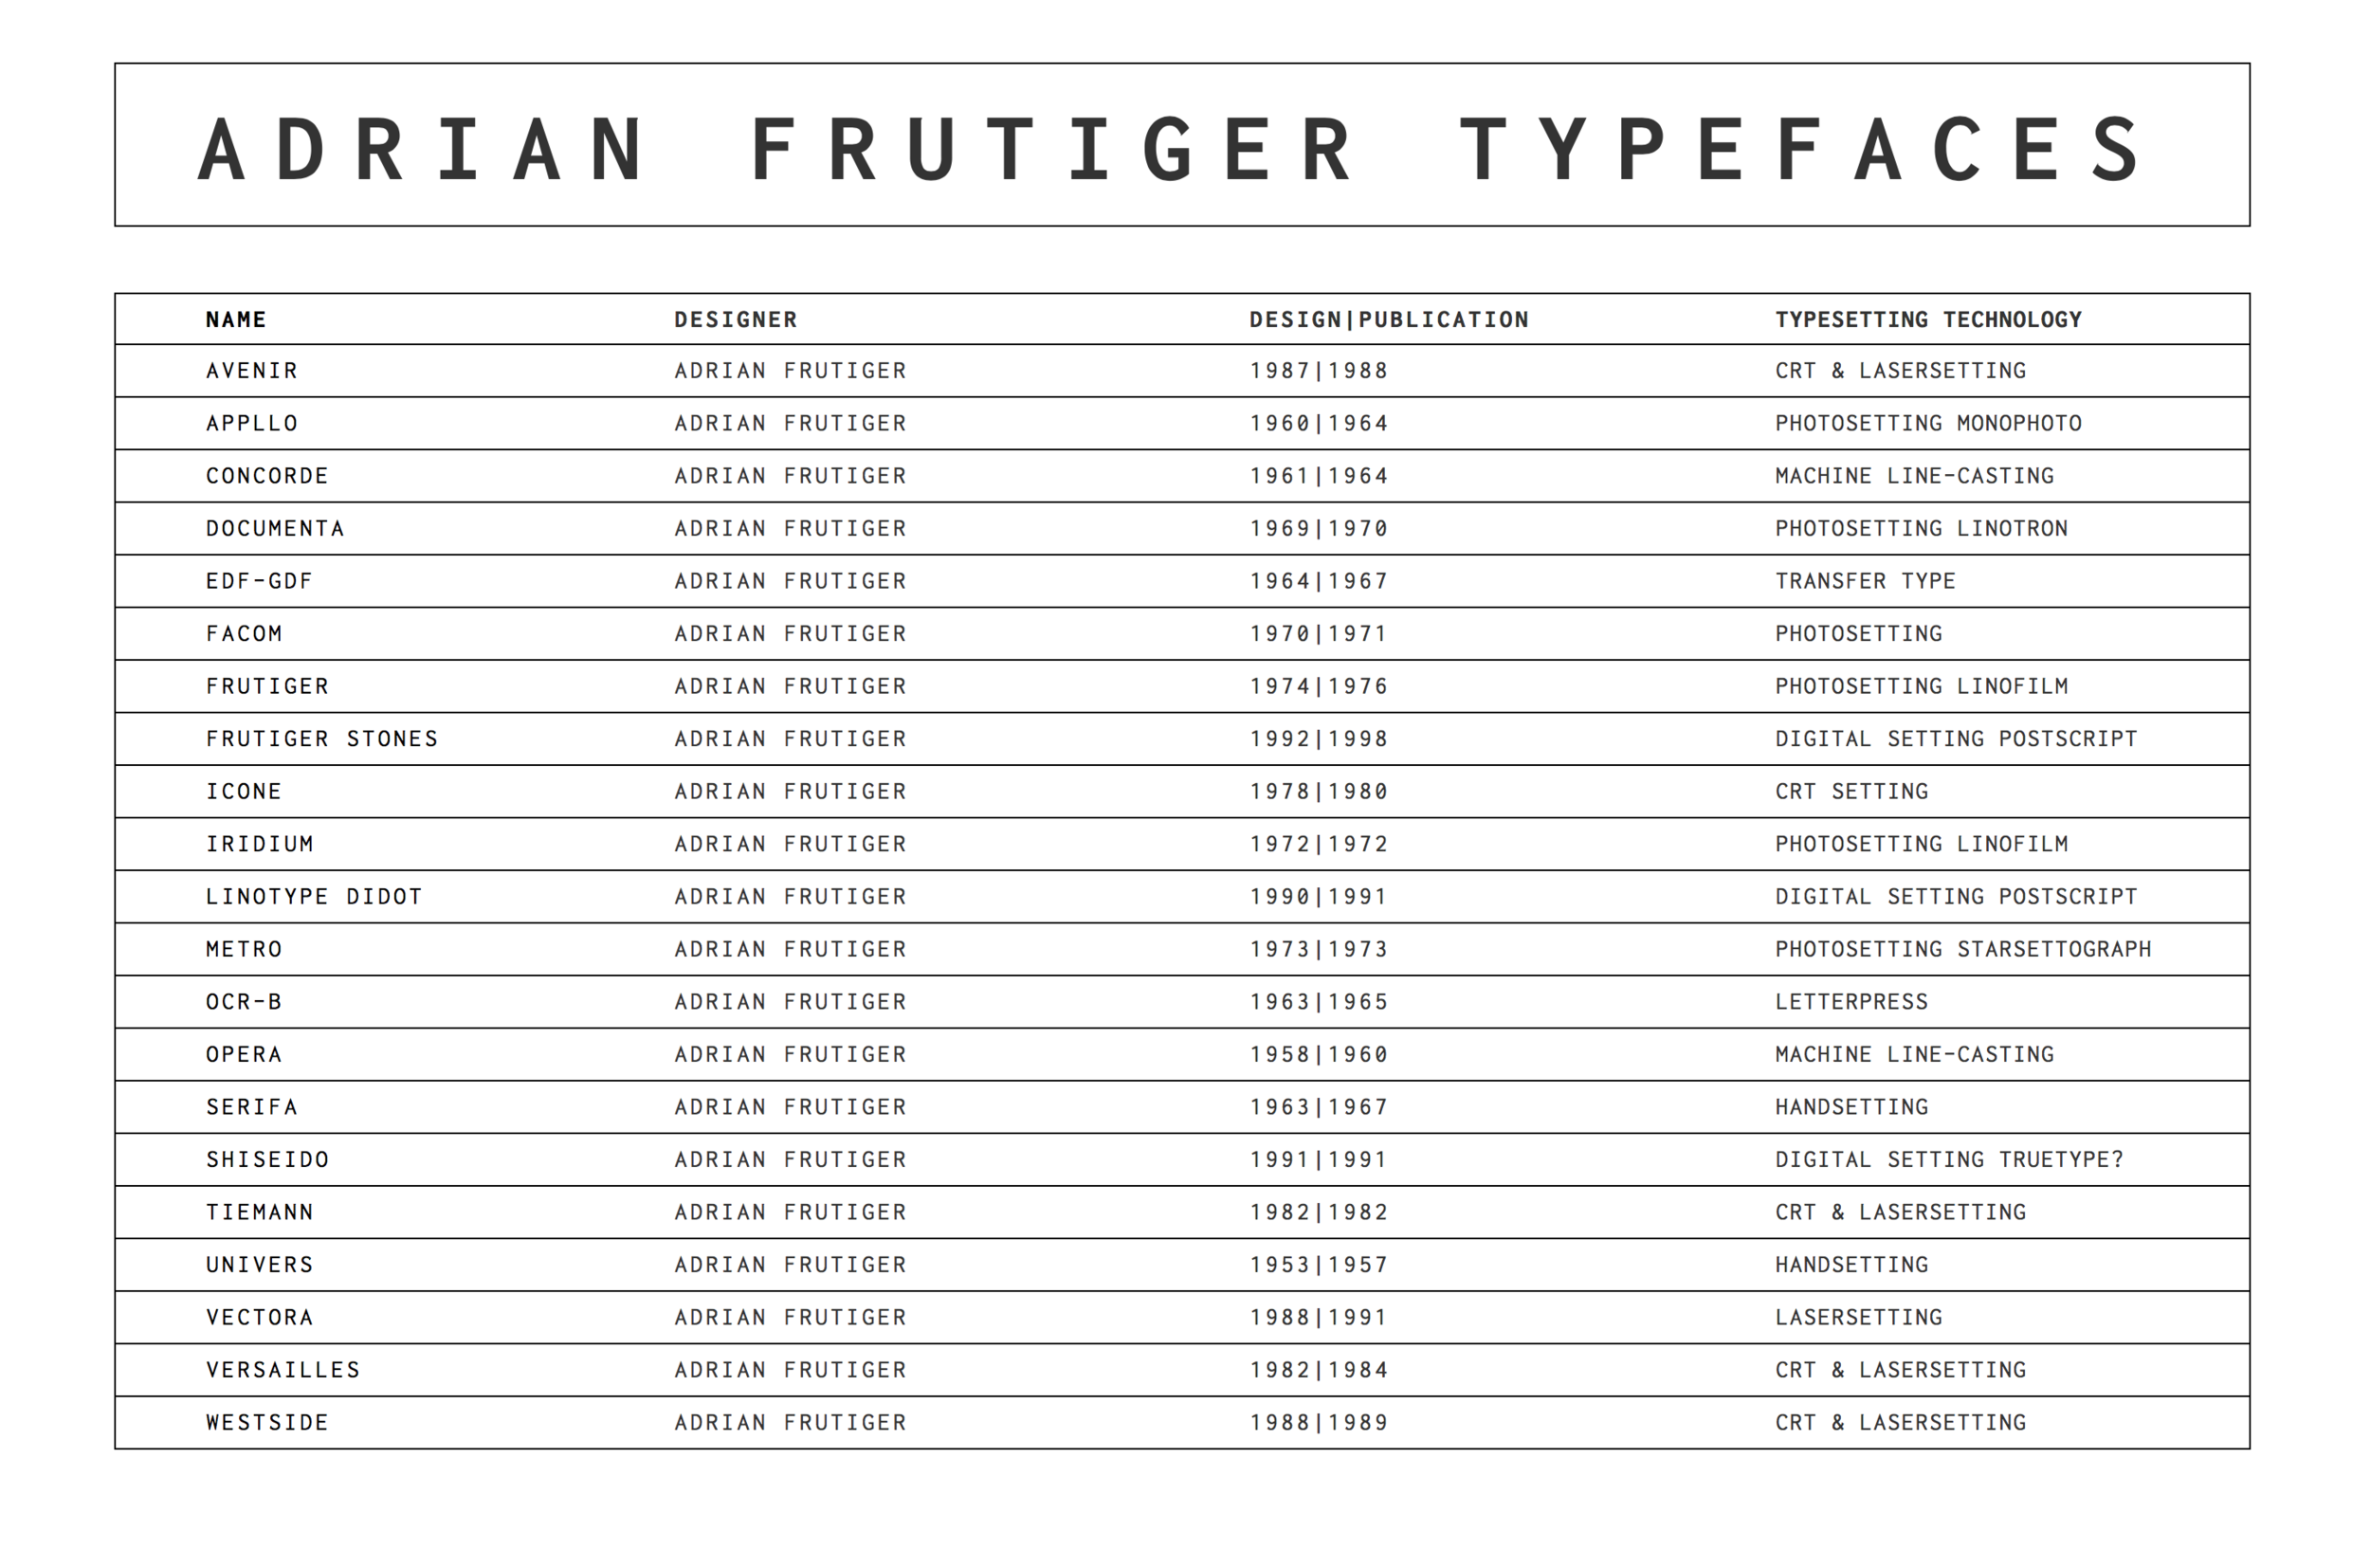 Adrian Frutiger Typefaces Study Website